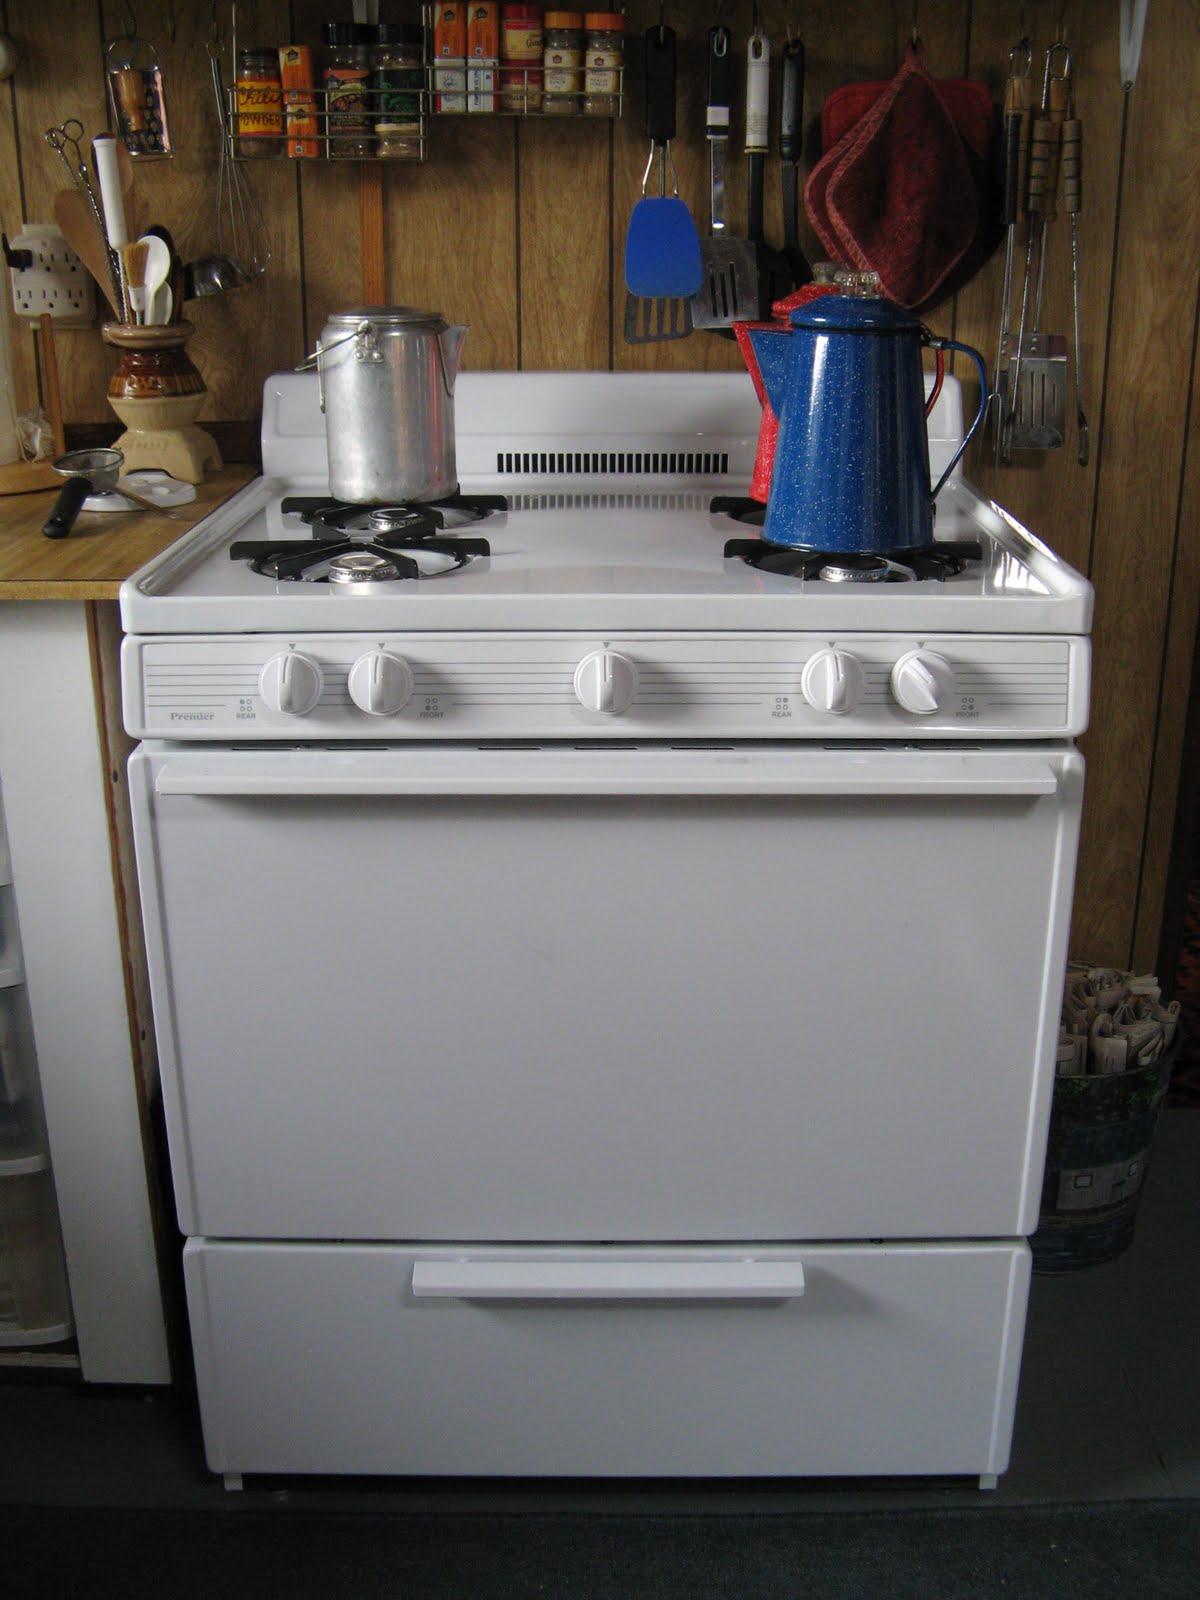 propane kitchen stove small outdoor kitchens powell river books blog premier 30 quot freestanding